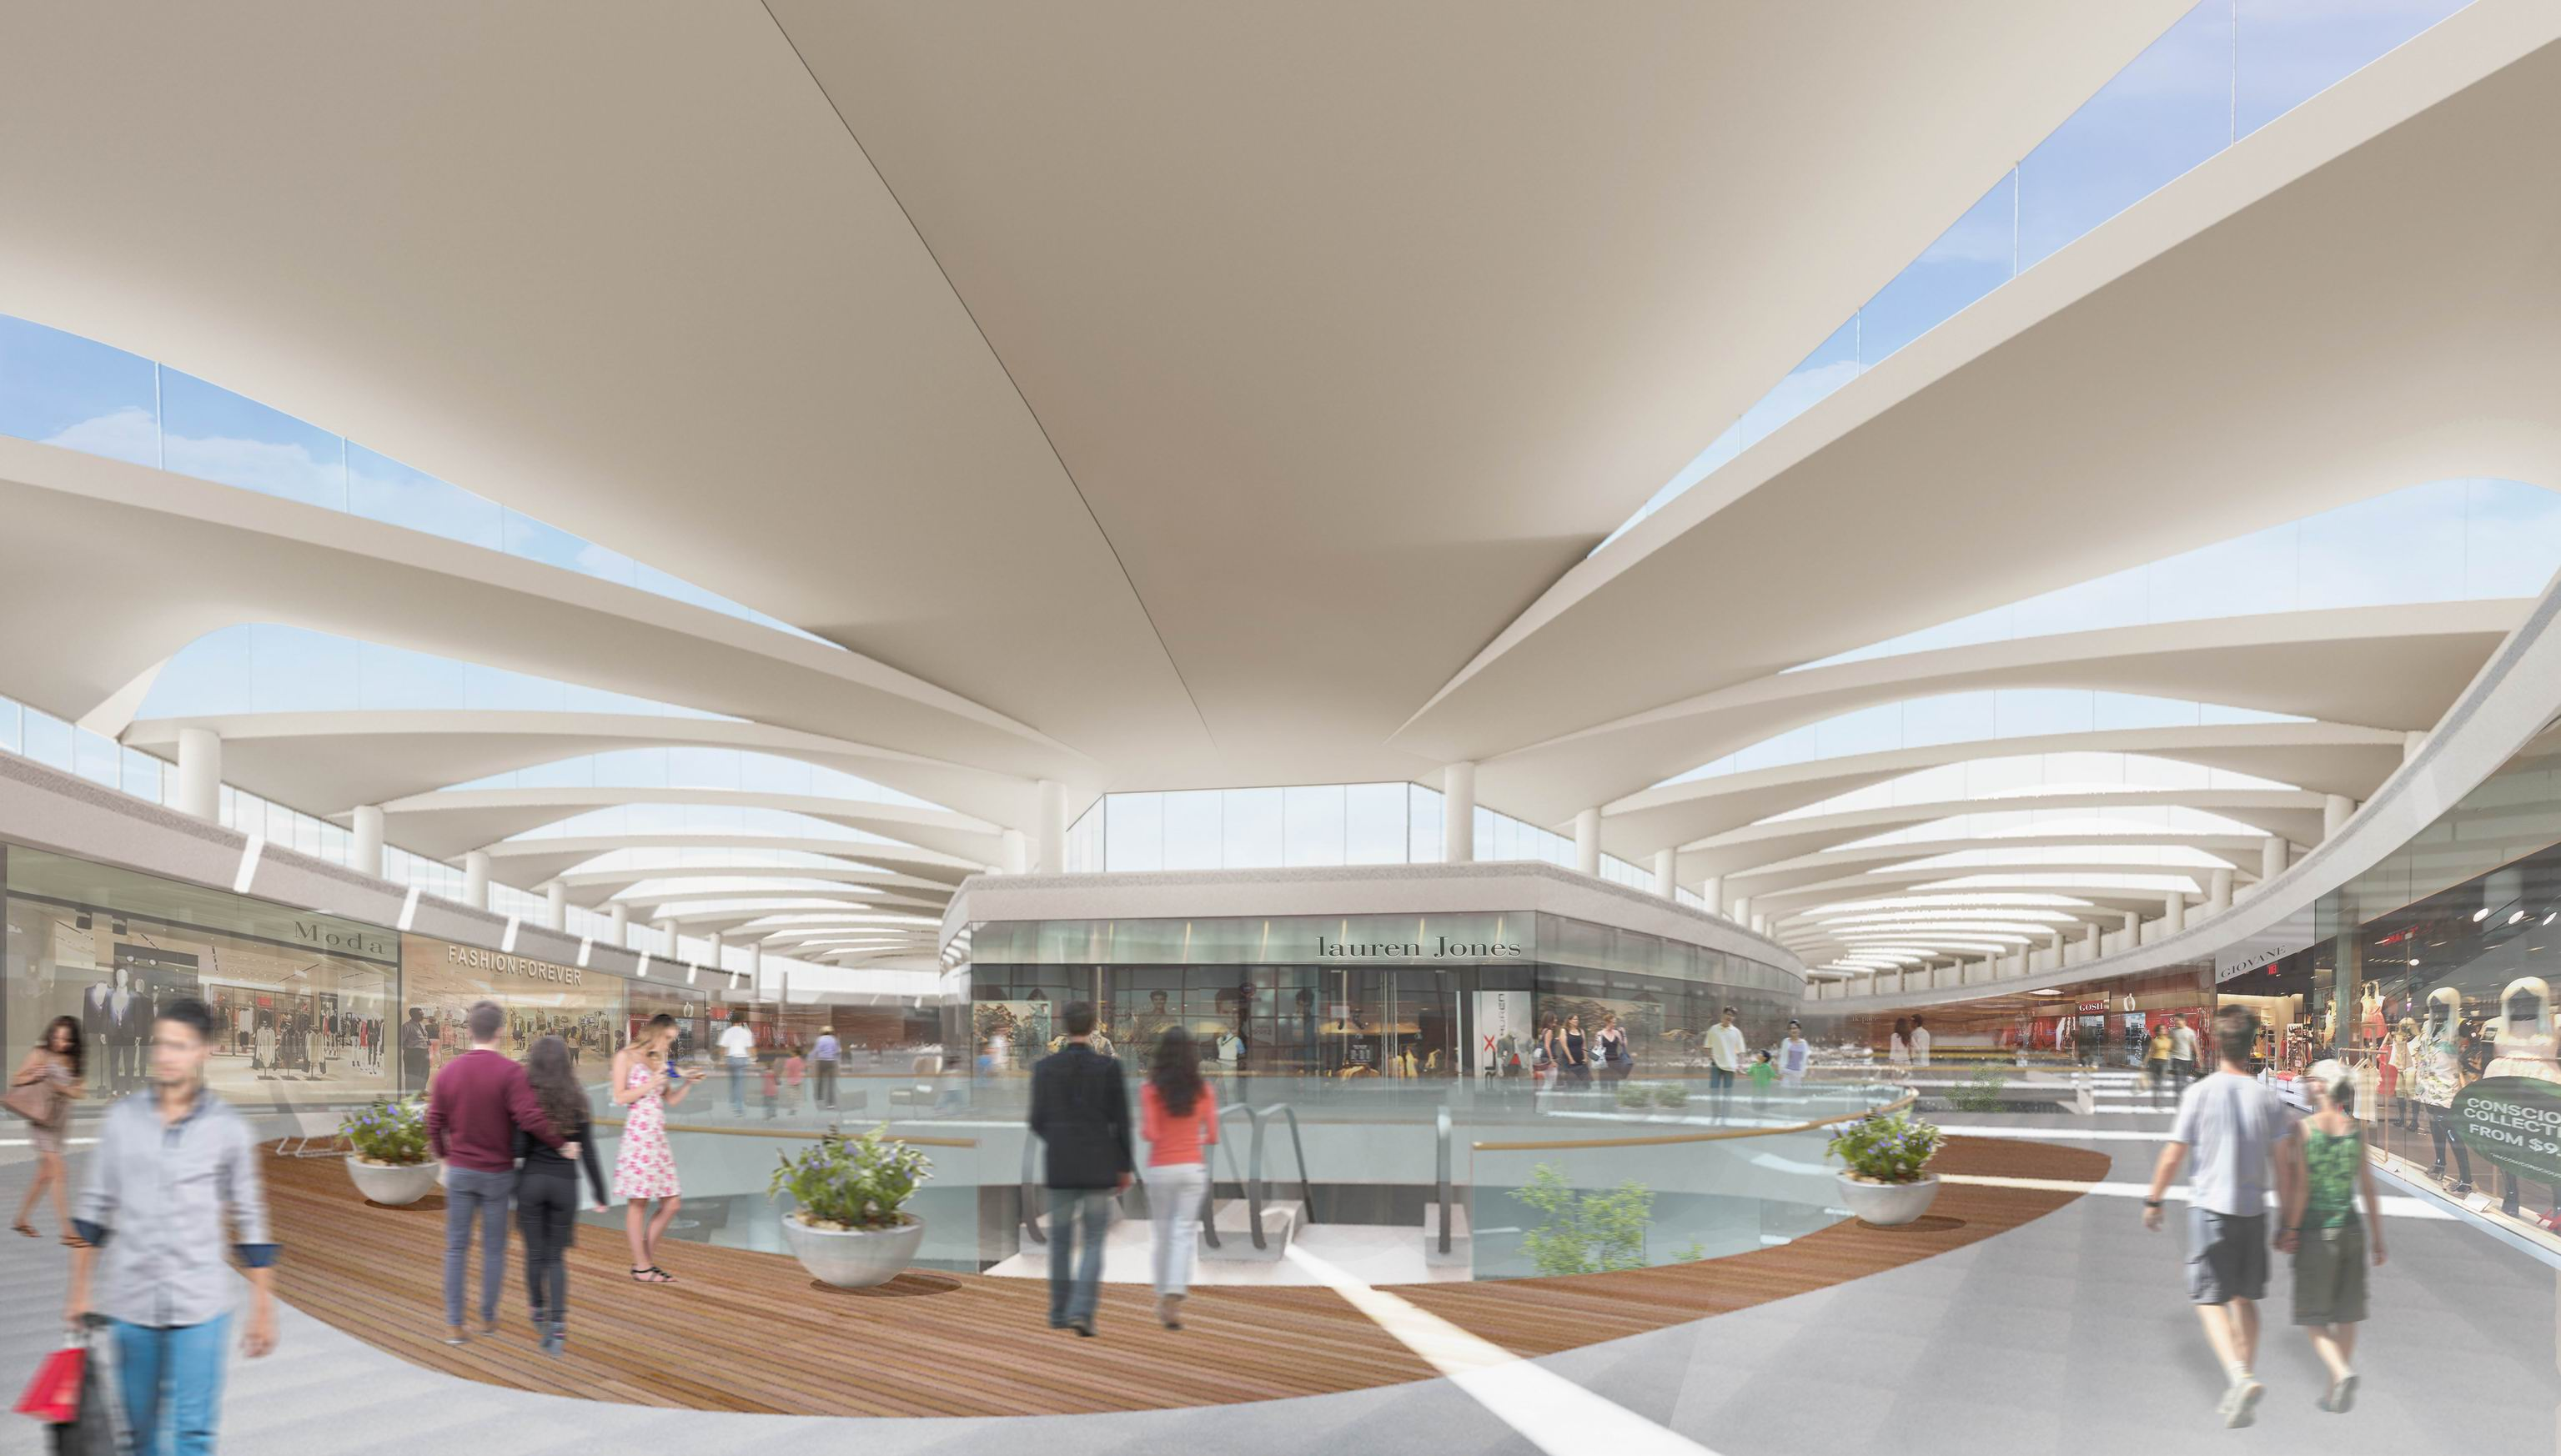 JDAP approves amendments to Karrinyup Shopping Centre development